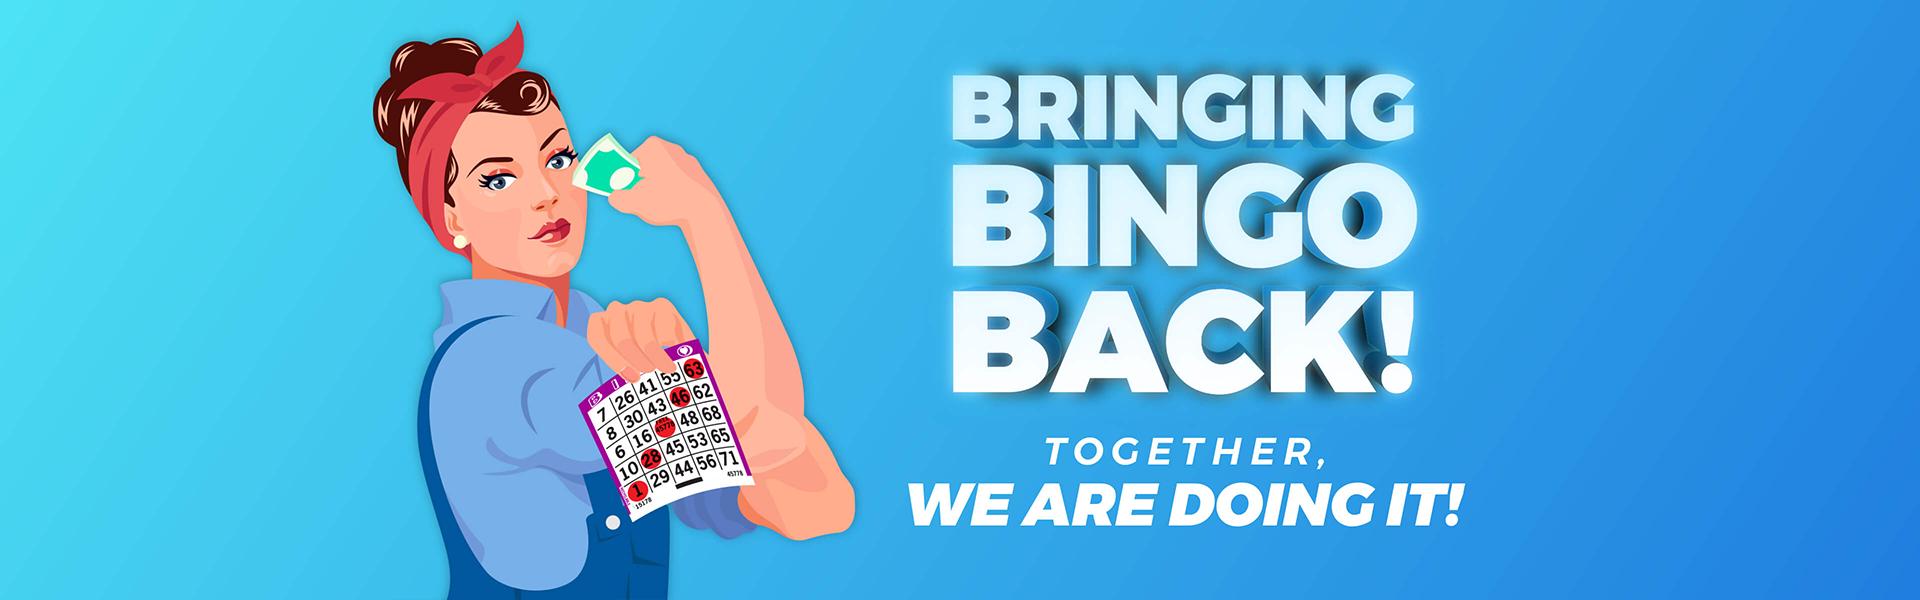 Bring Bingo Back